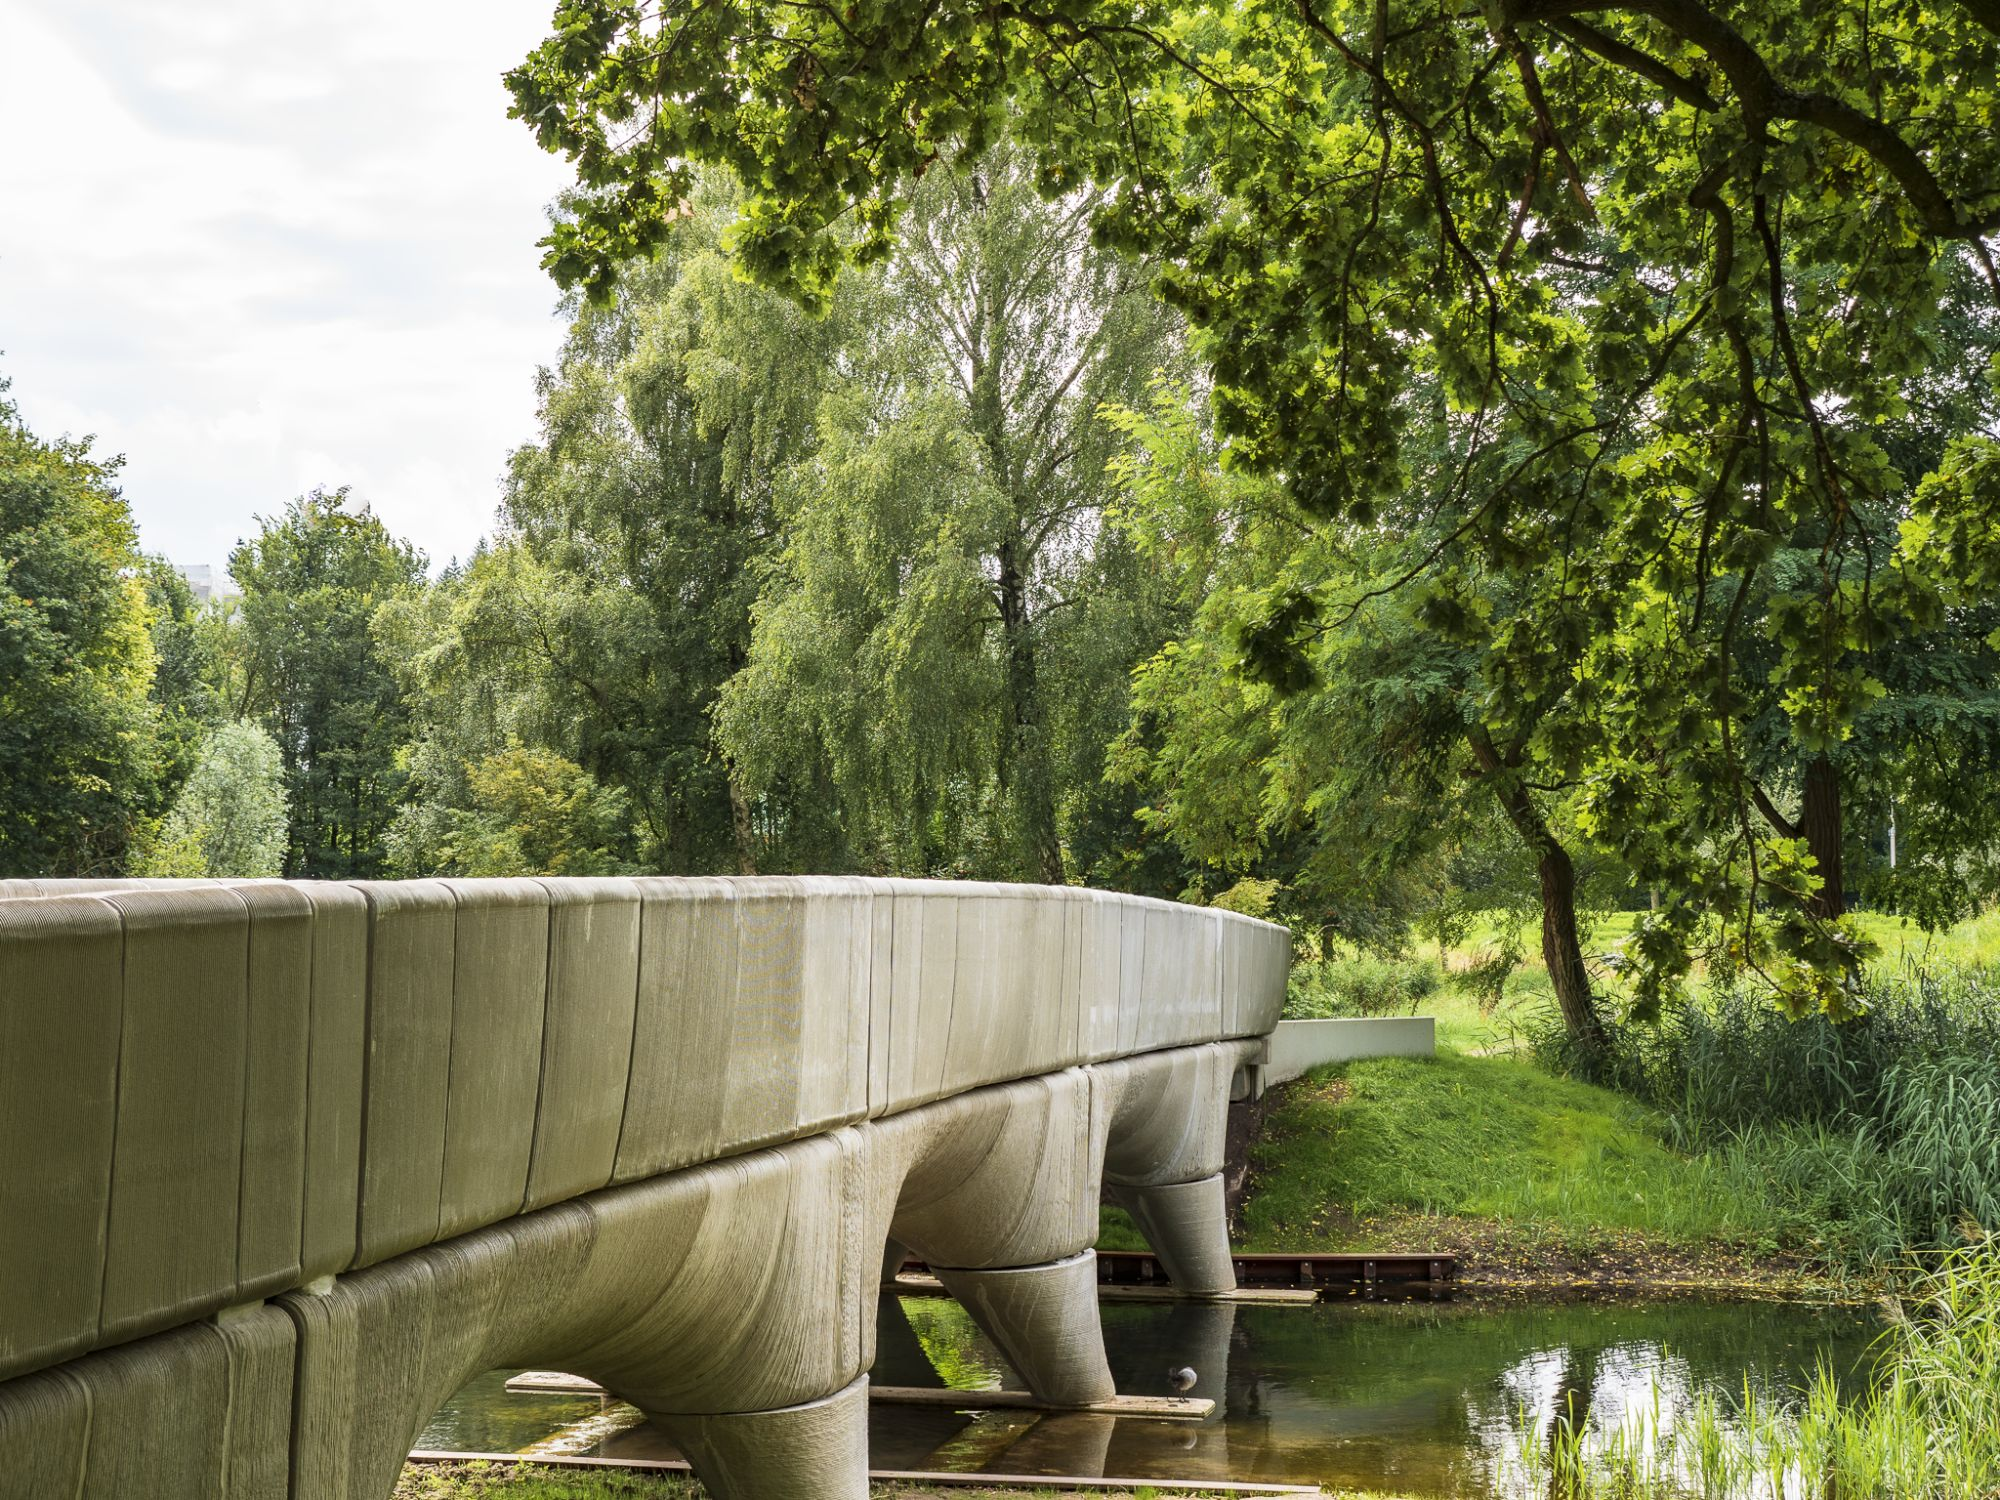 The 29-meter 3D printed bridge. Photo via Municipality of Nijmegen/Michiel van der Kley.